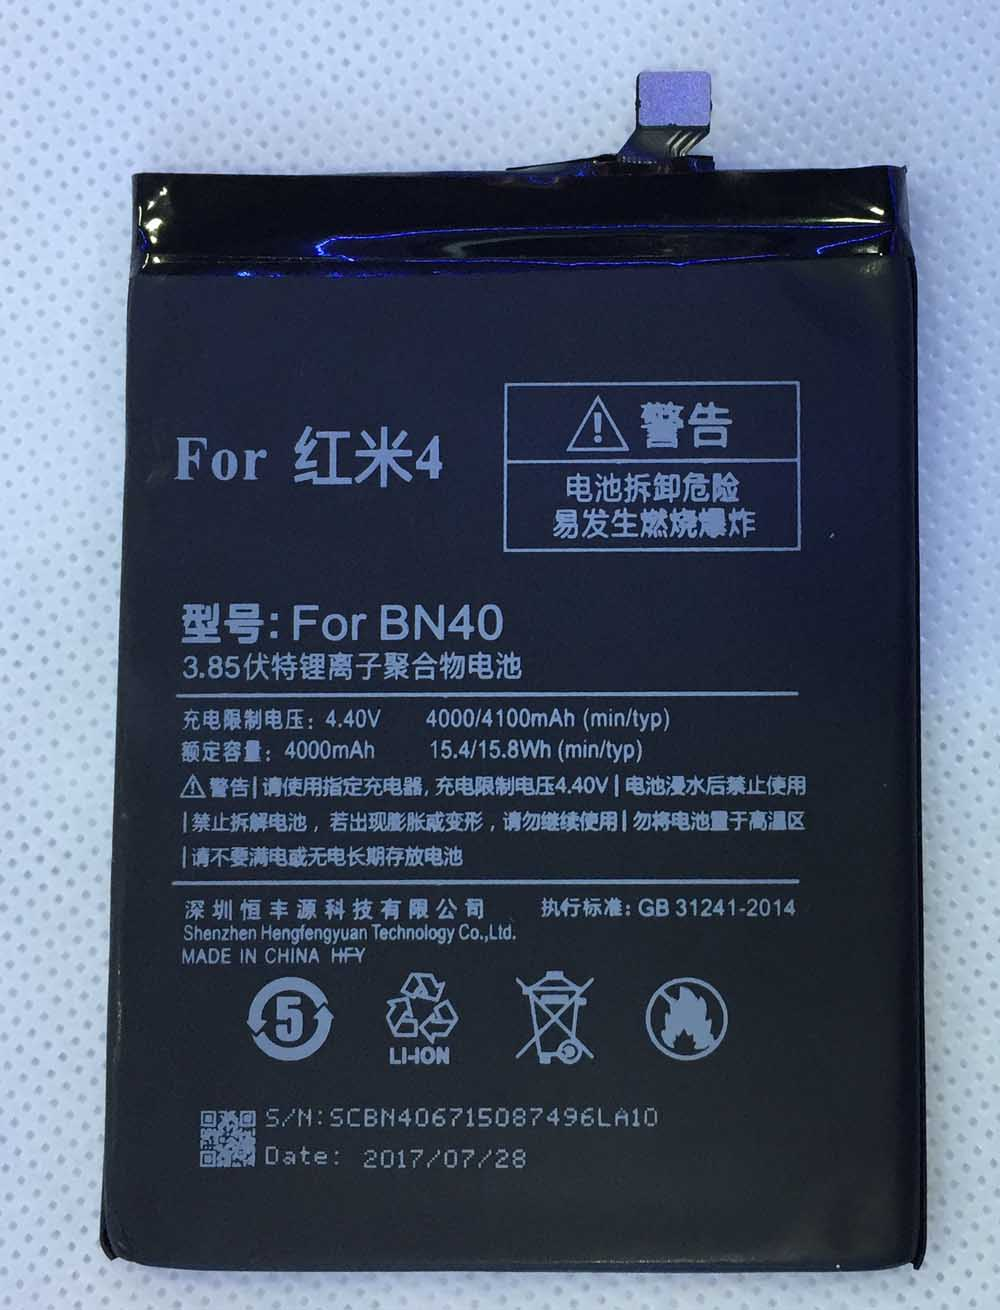 HFY BN40 For Xiaomi Redmi 4 Pro for 3G RAM 32G ROM Edition <font><b>cellphone</b></font> <font><b>4000mAh</b></font> BN 40 Battery